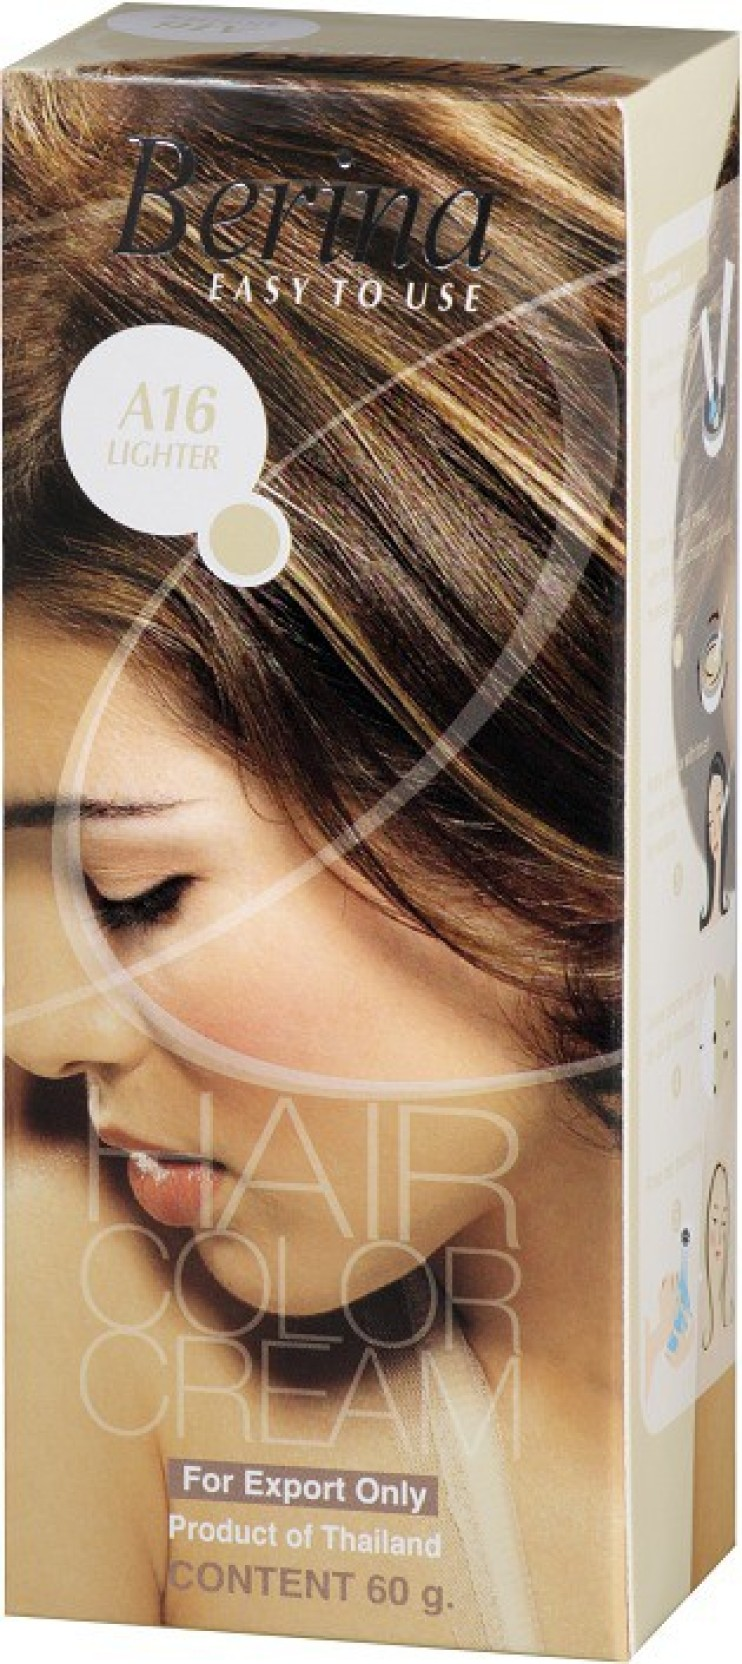 Berina Lighter Hair Color Cream Hair Color Price In India Buy